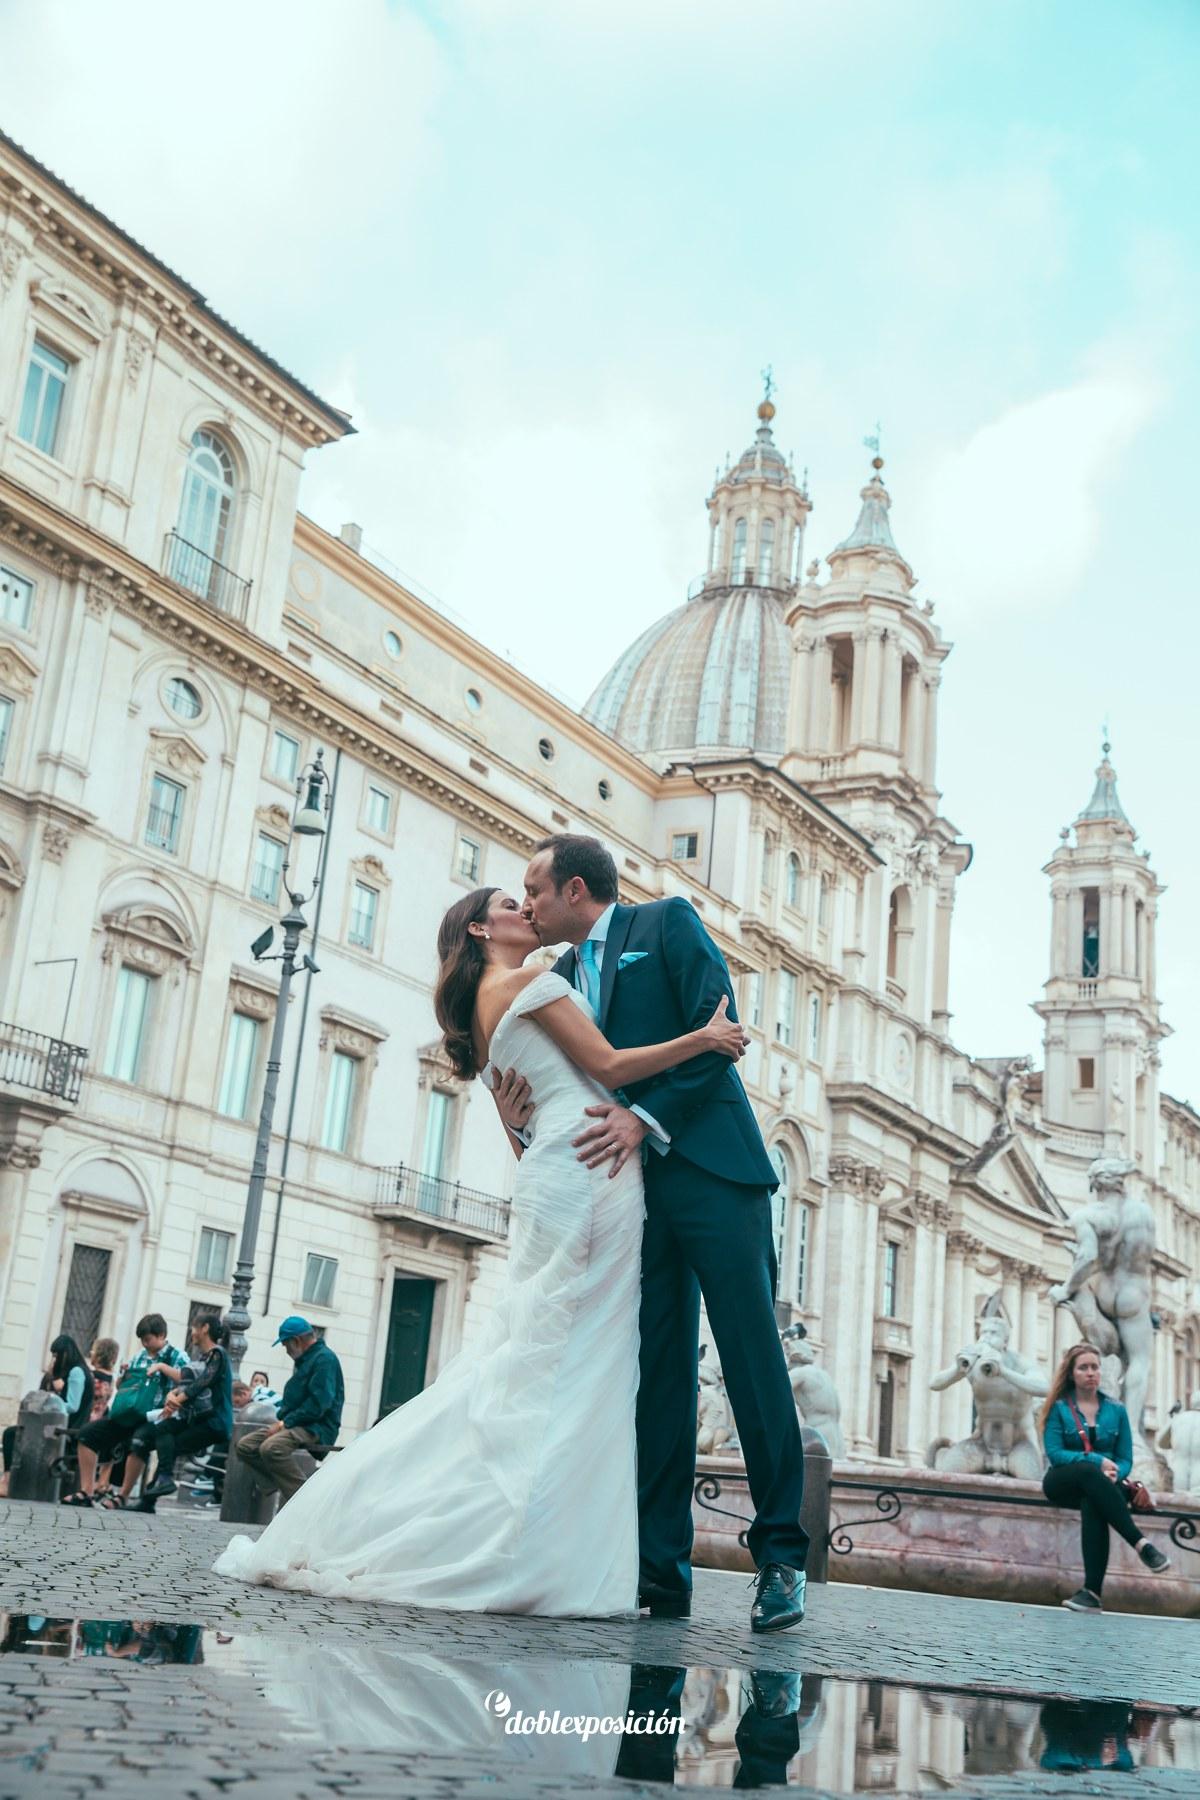 fotografos-boda-postboda-italia-roma-ciudad-eterna_0011